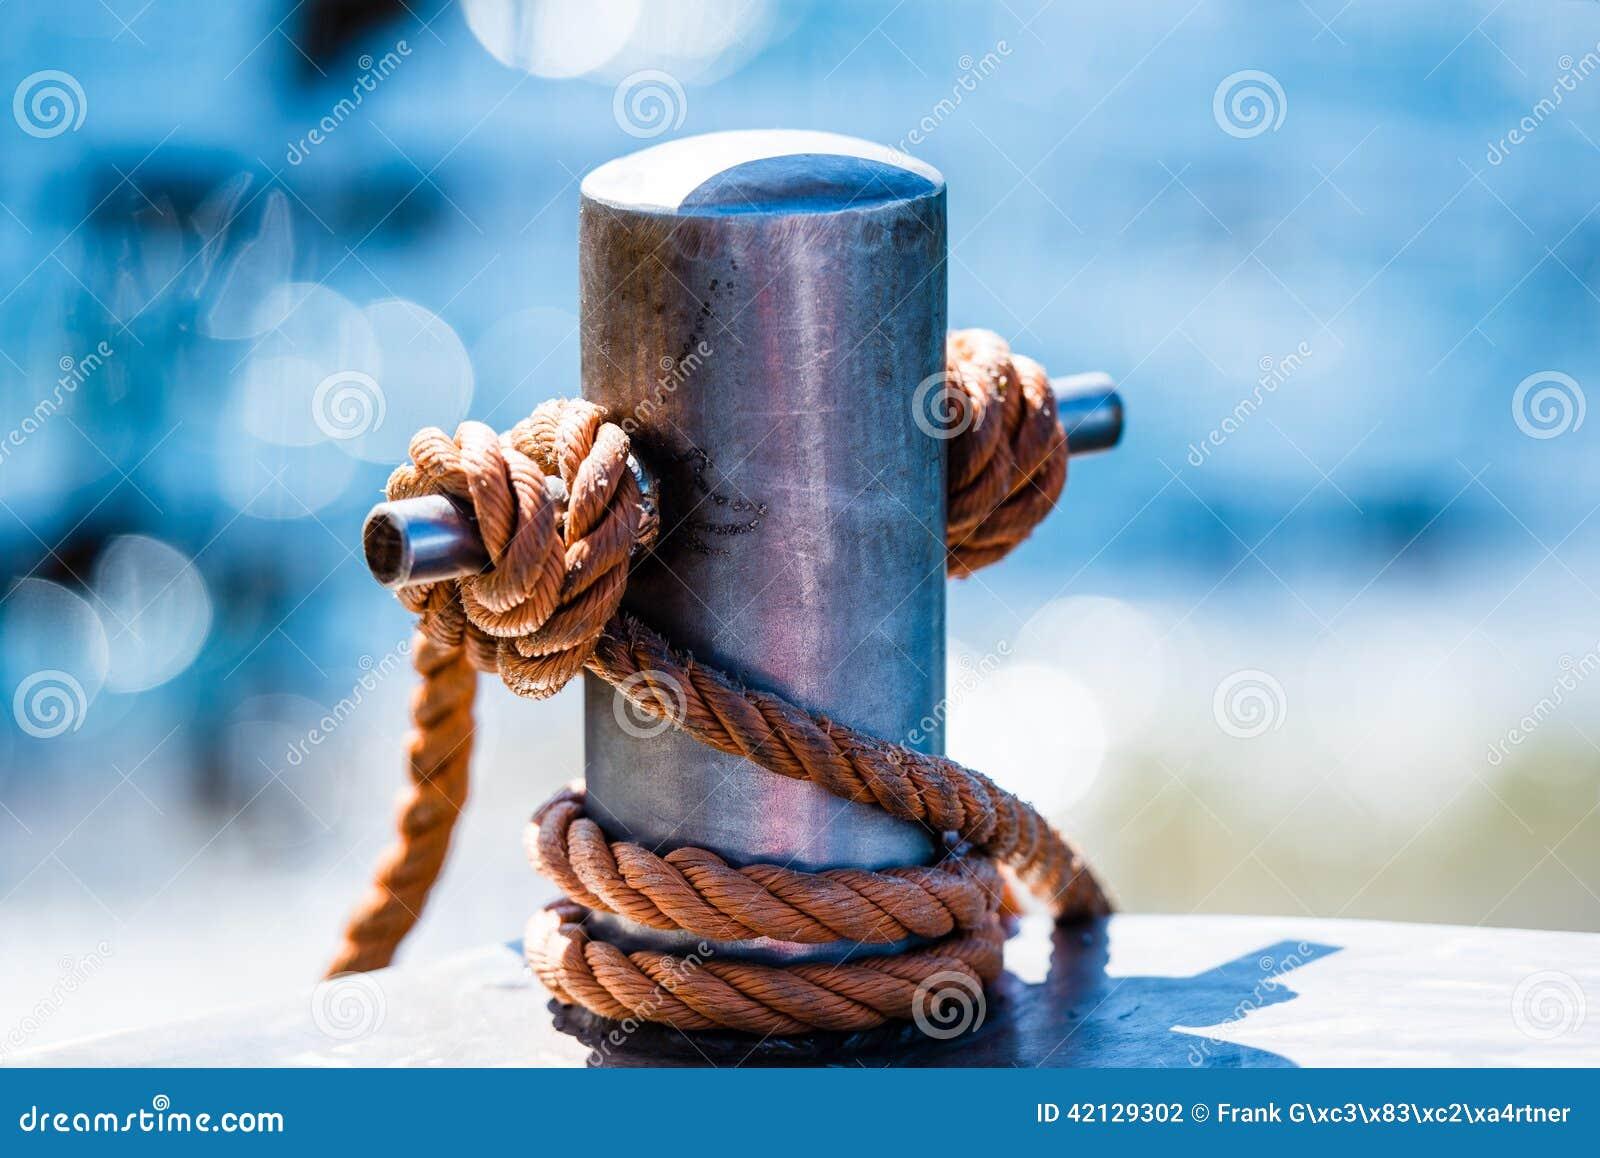 Abstract: Bollard And Rope Stock Photo - Image: 42129302